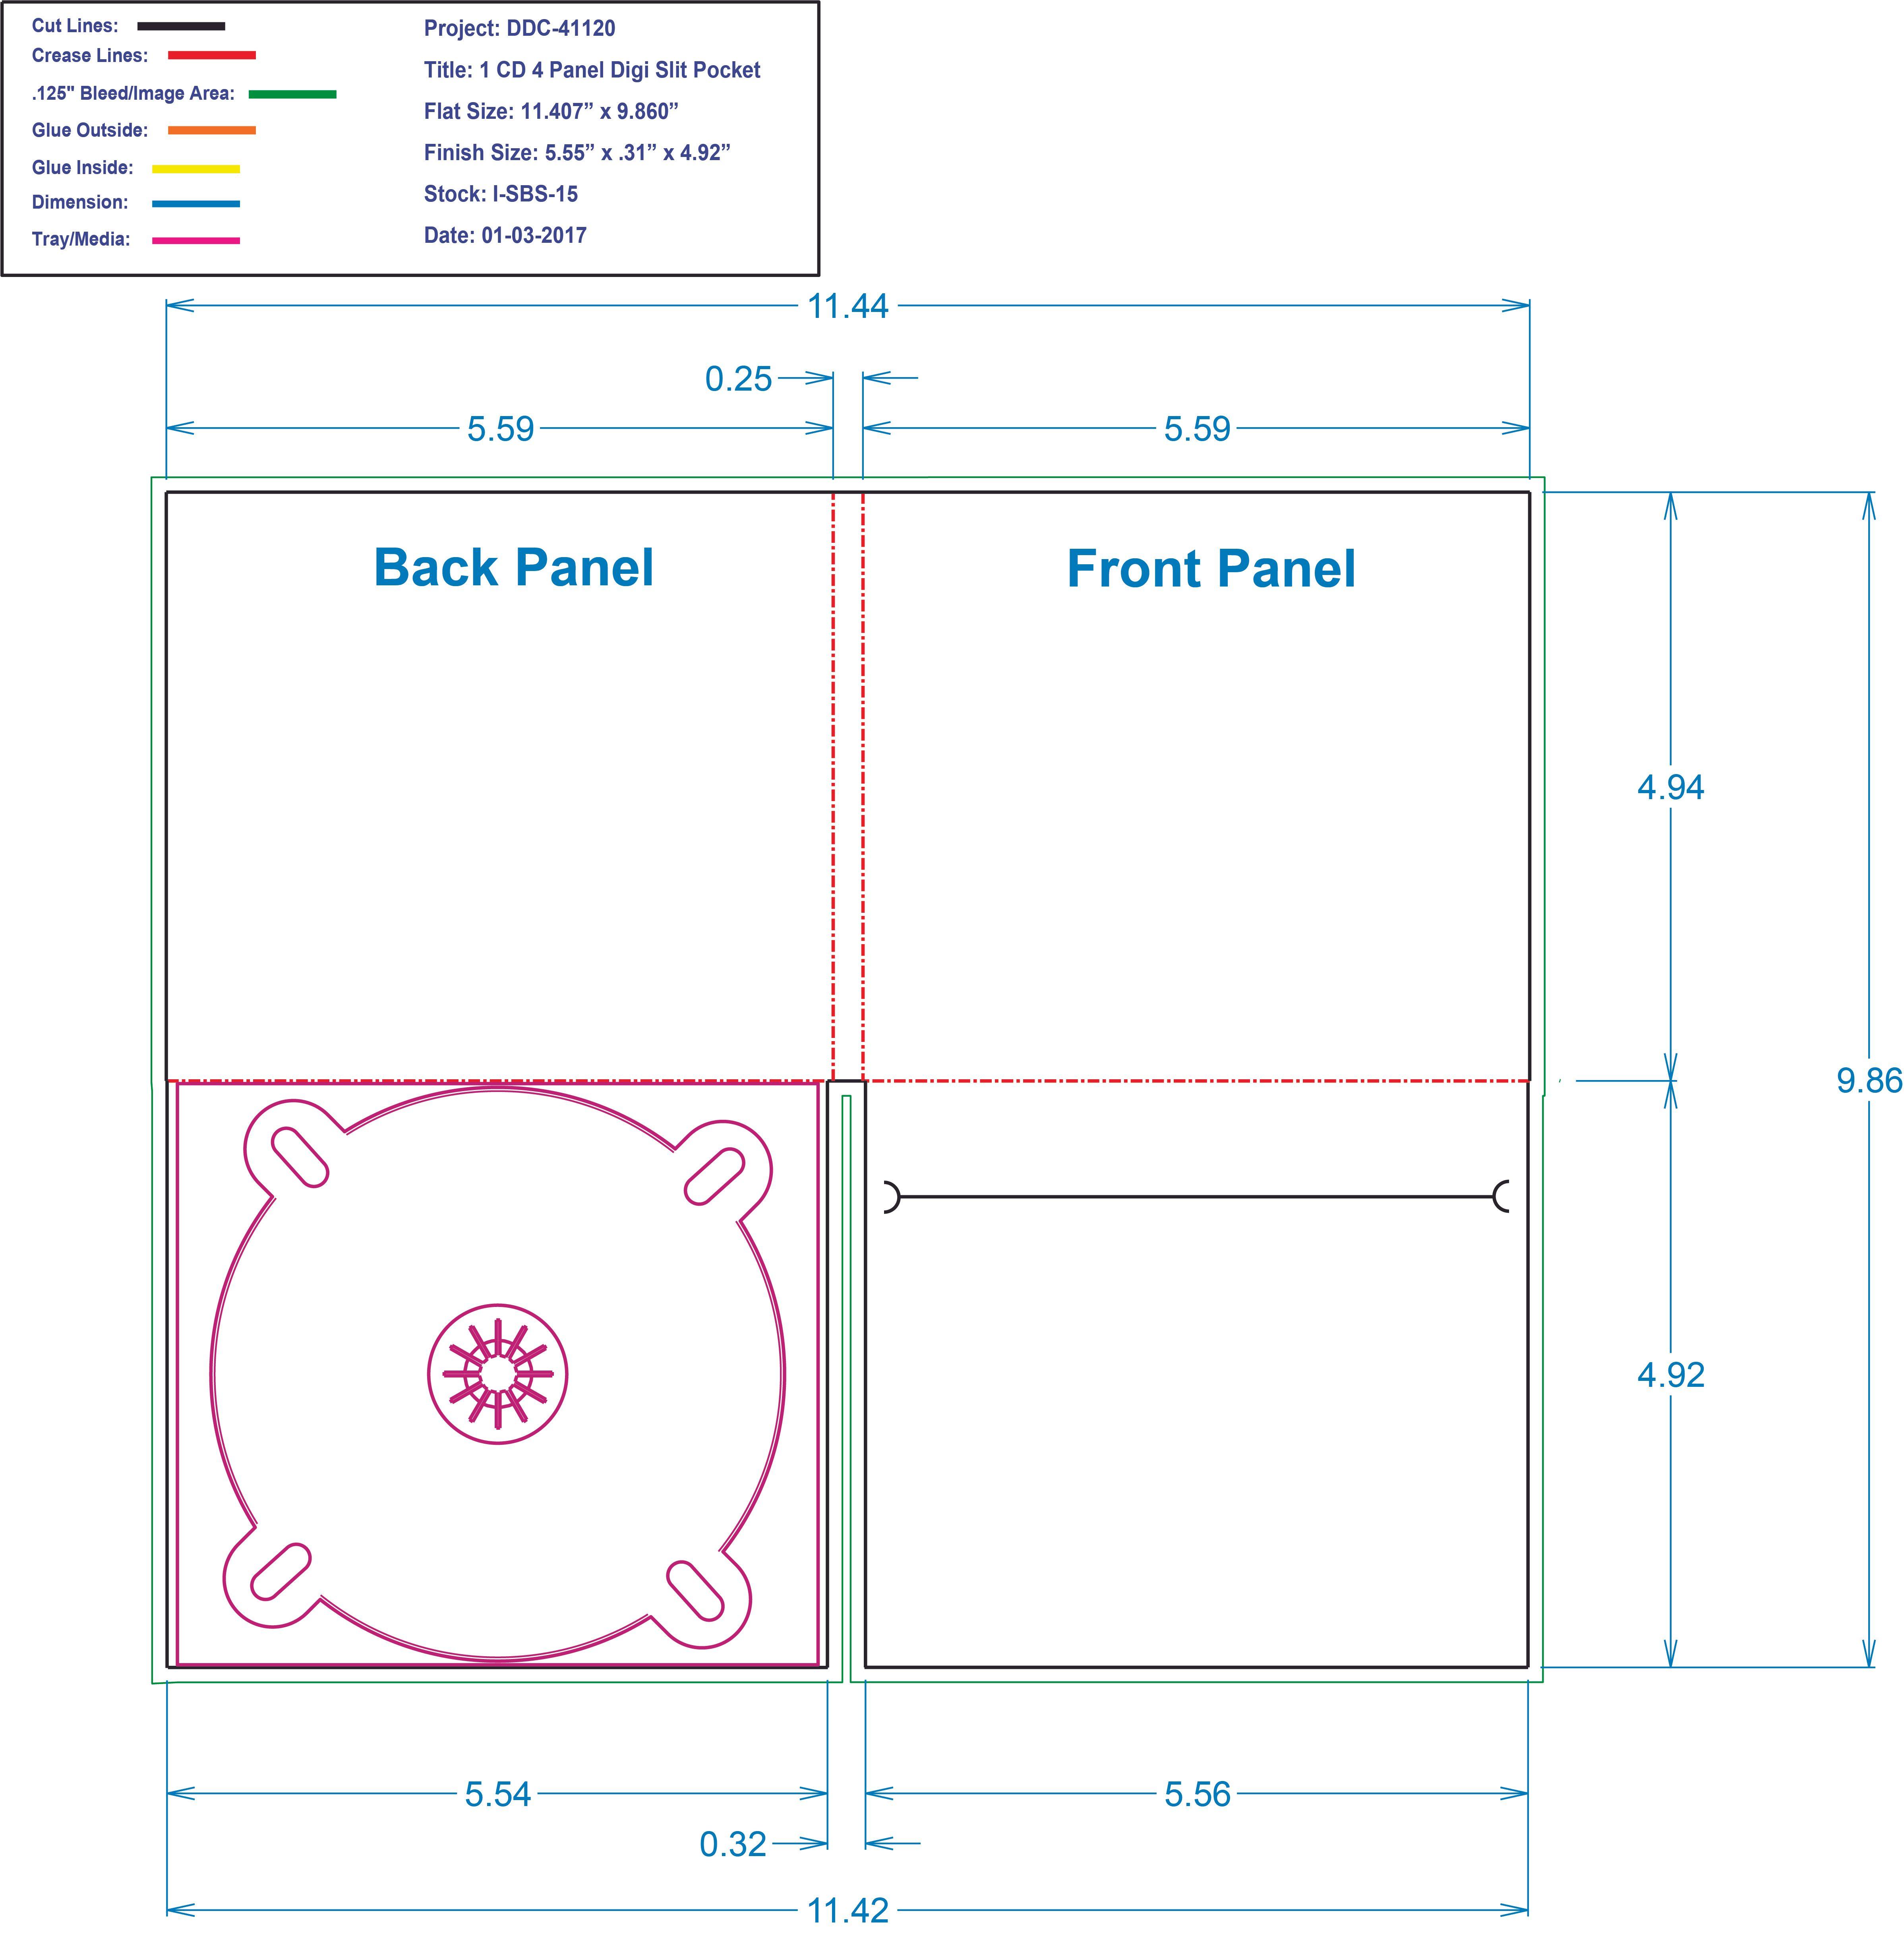 DDC41120 - 4 Panel Digi 1 Tray, Slit Pocket